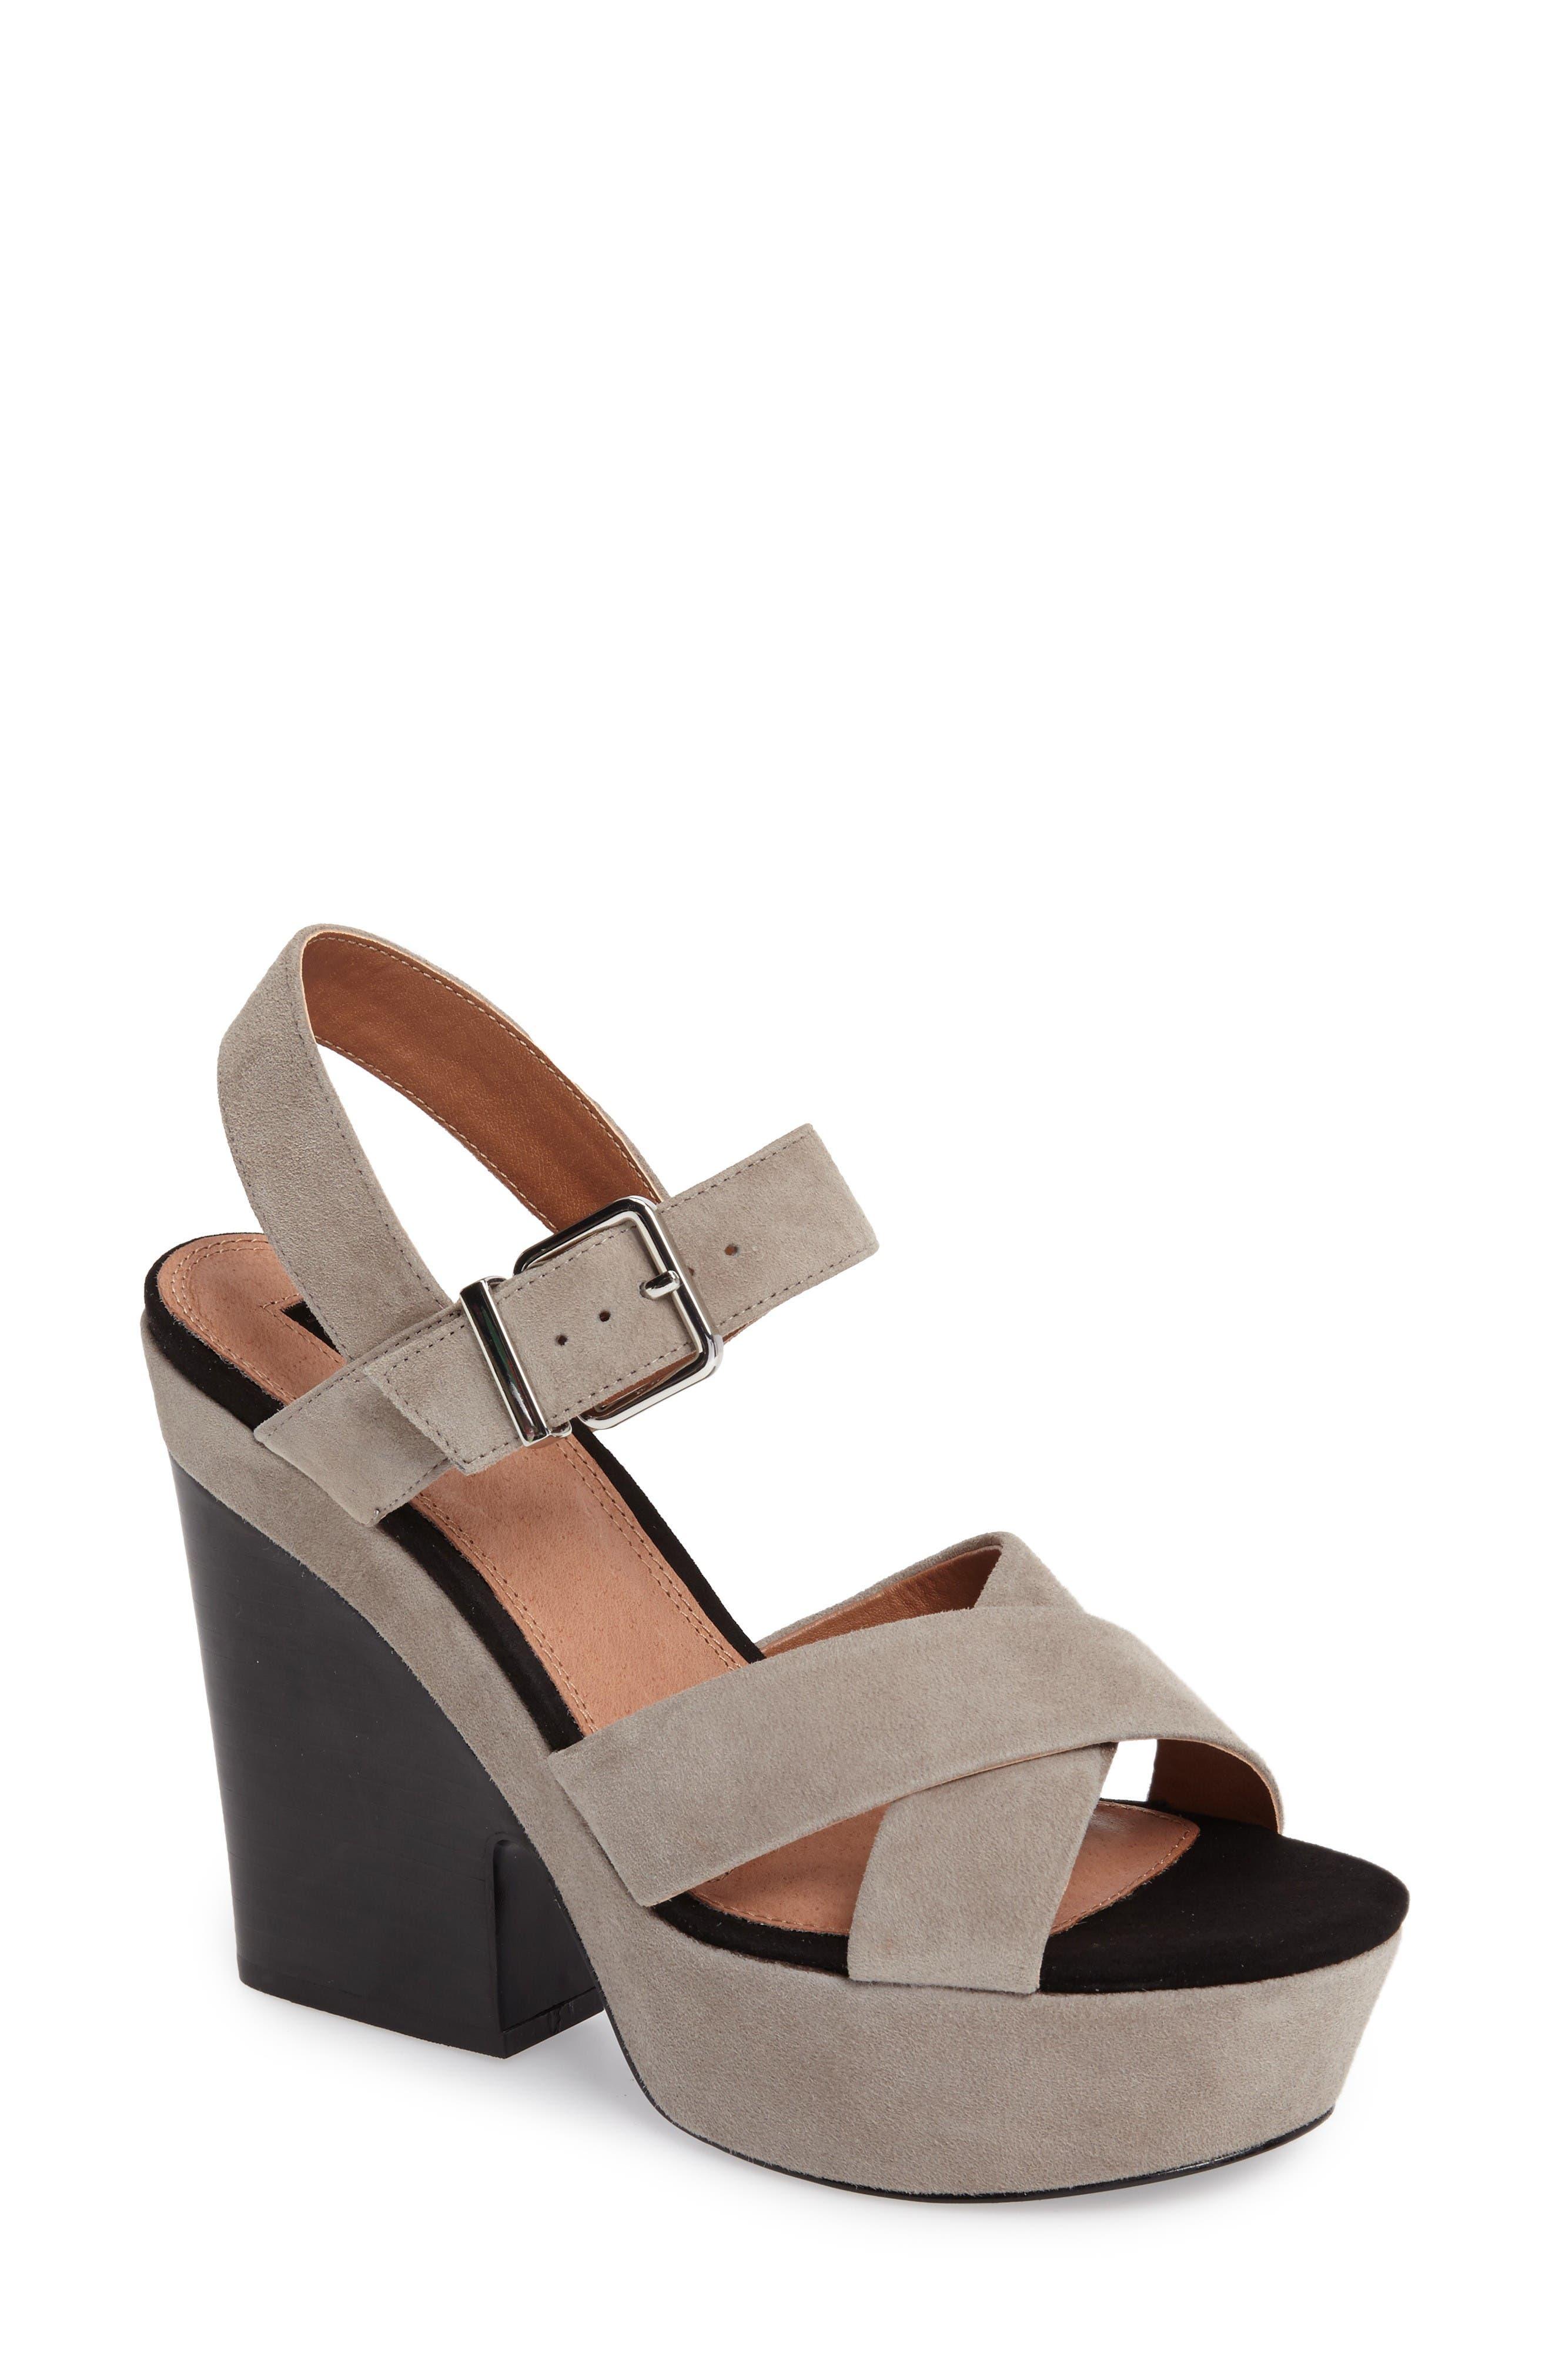 Alternate Image 1 Selected - Topshop Layla Platform Sandal (Women)